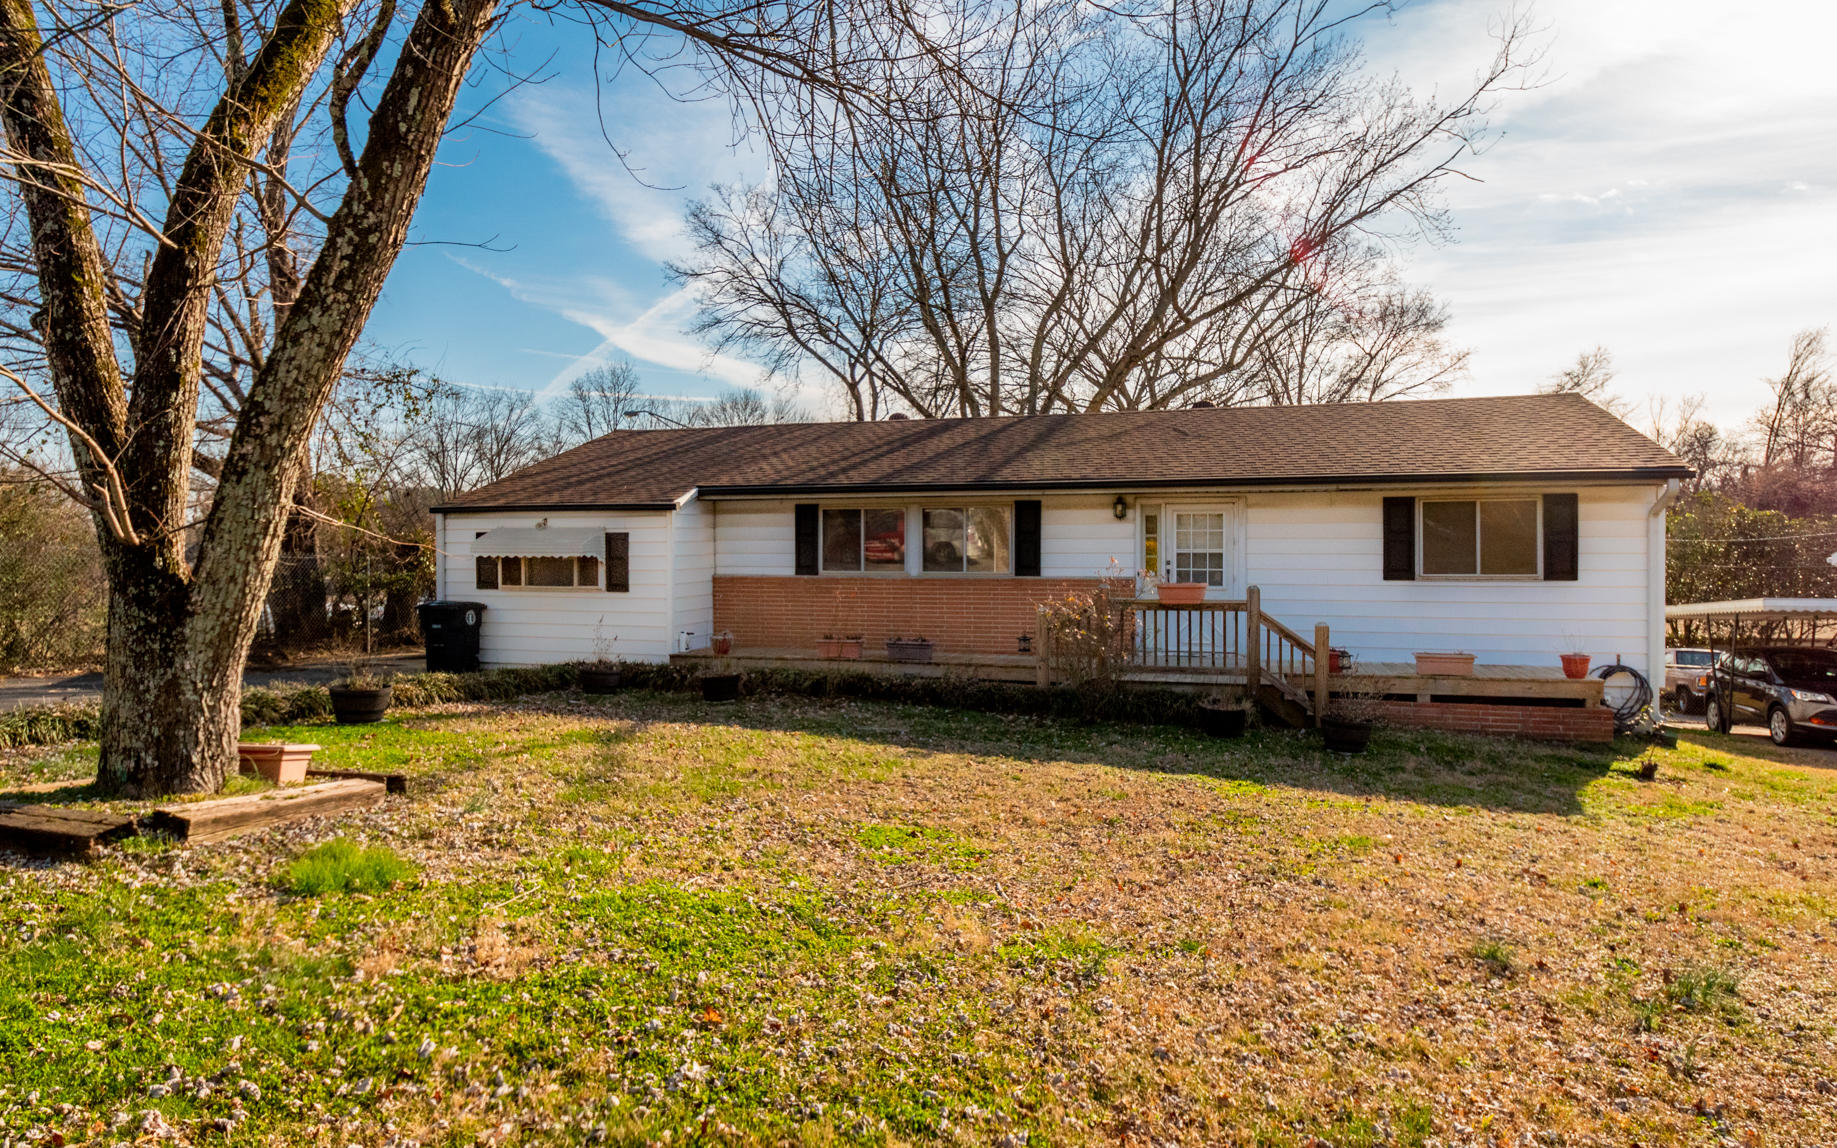 506 Donaldson Rd, Chattanooga, TN 37411